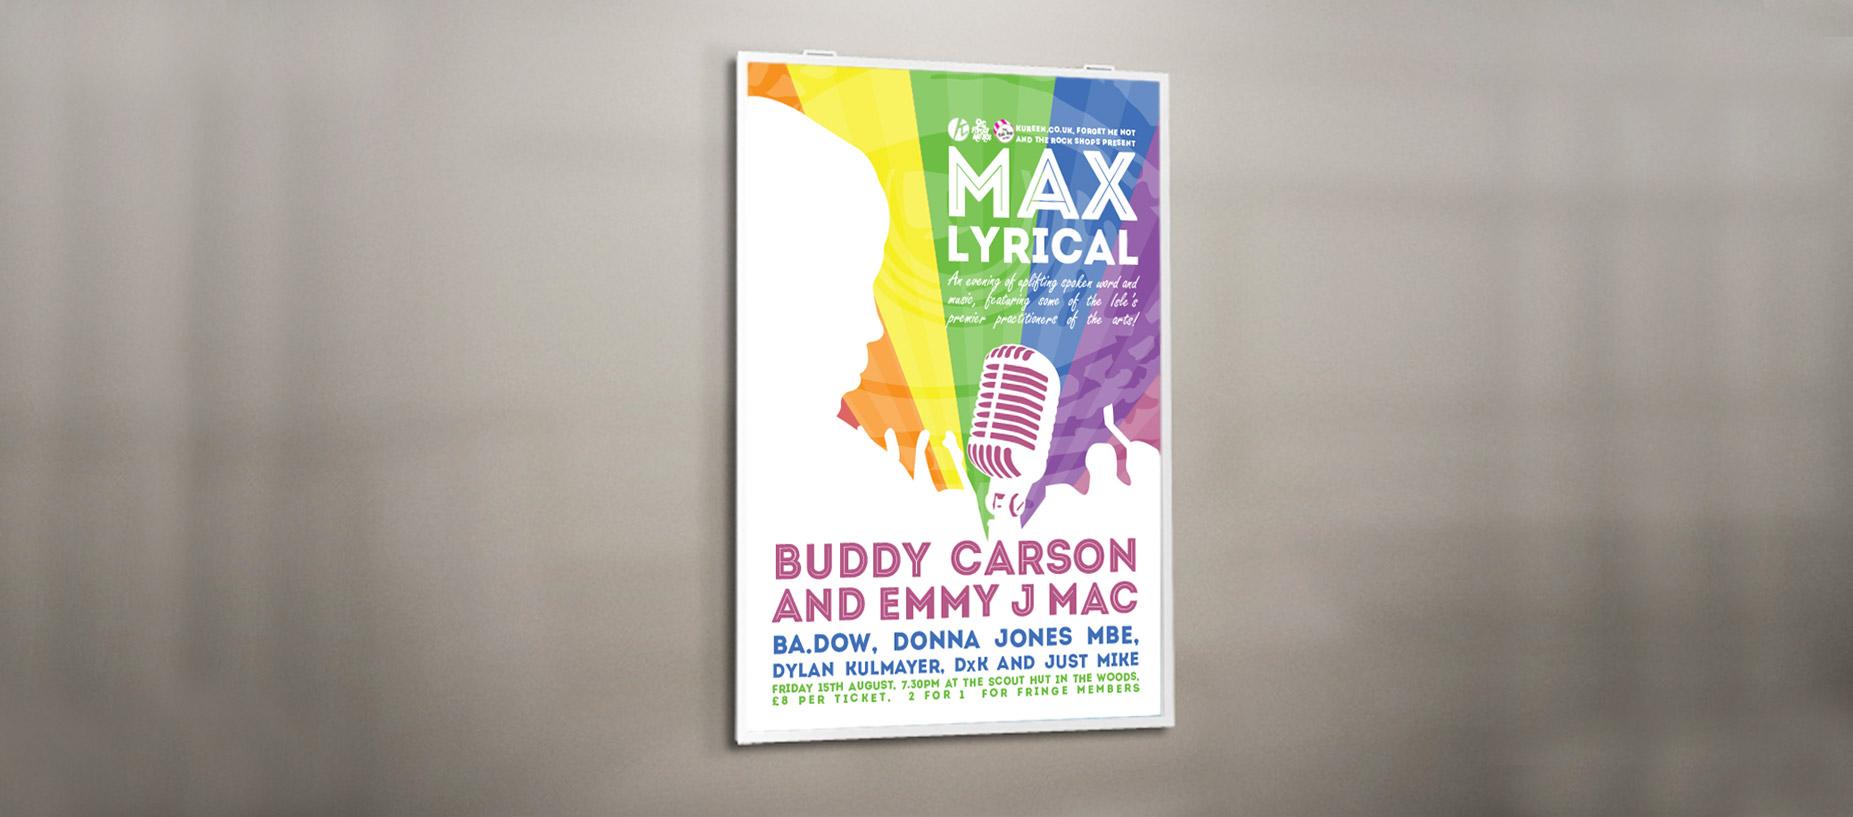 Max lyrical full poster design